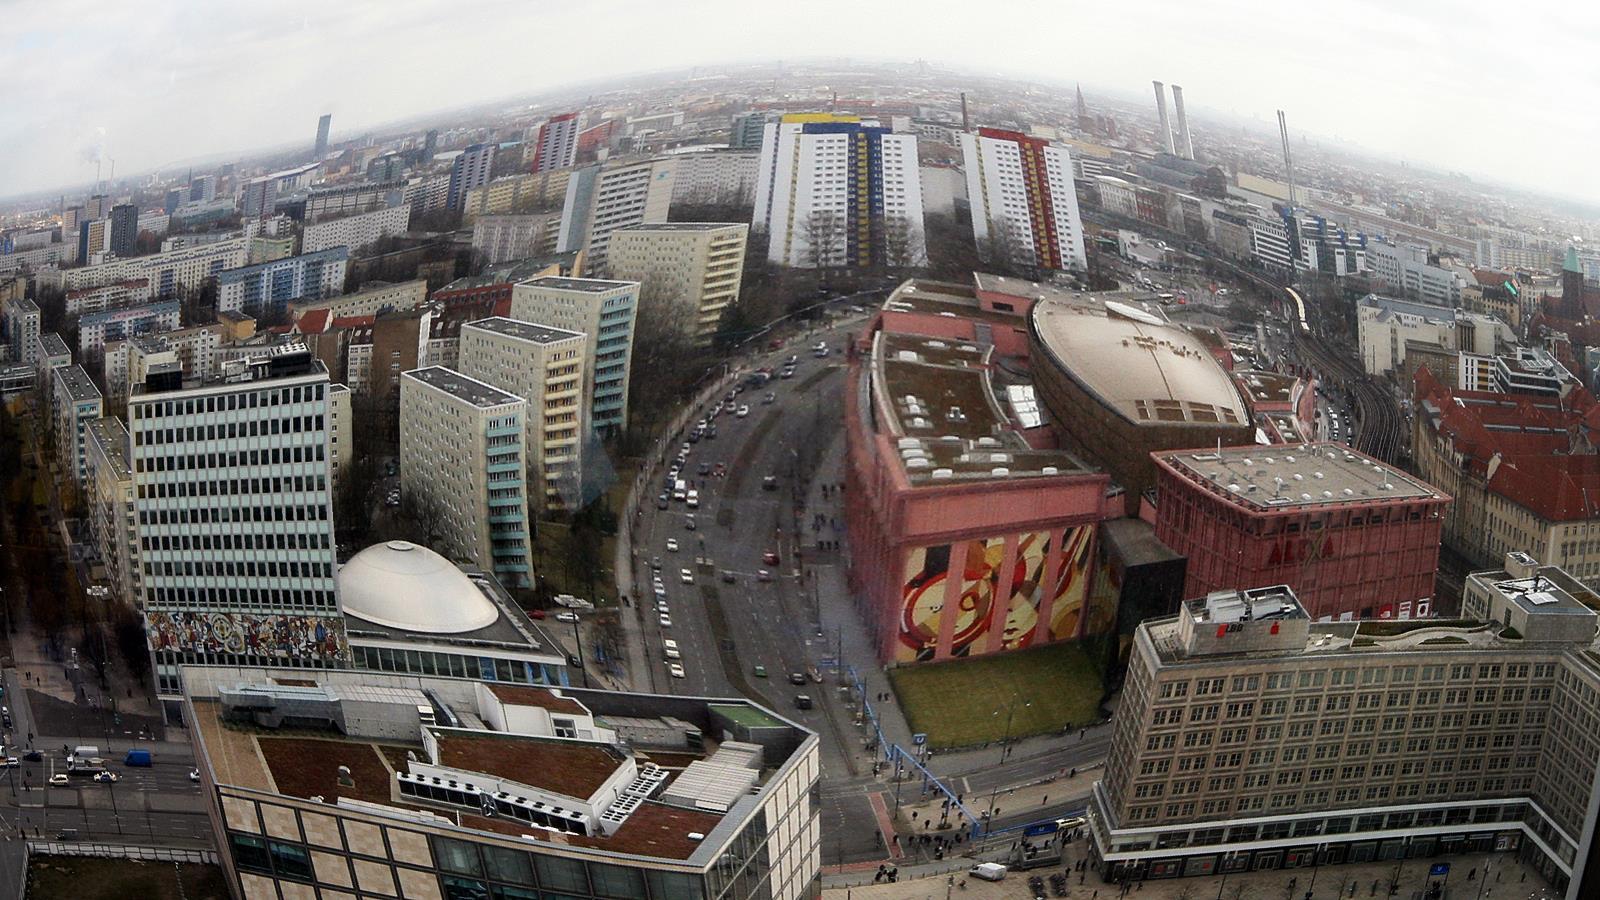 Bademuligheter I Berlin